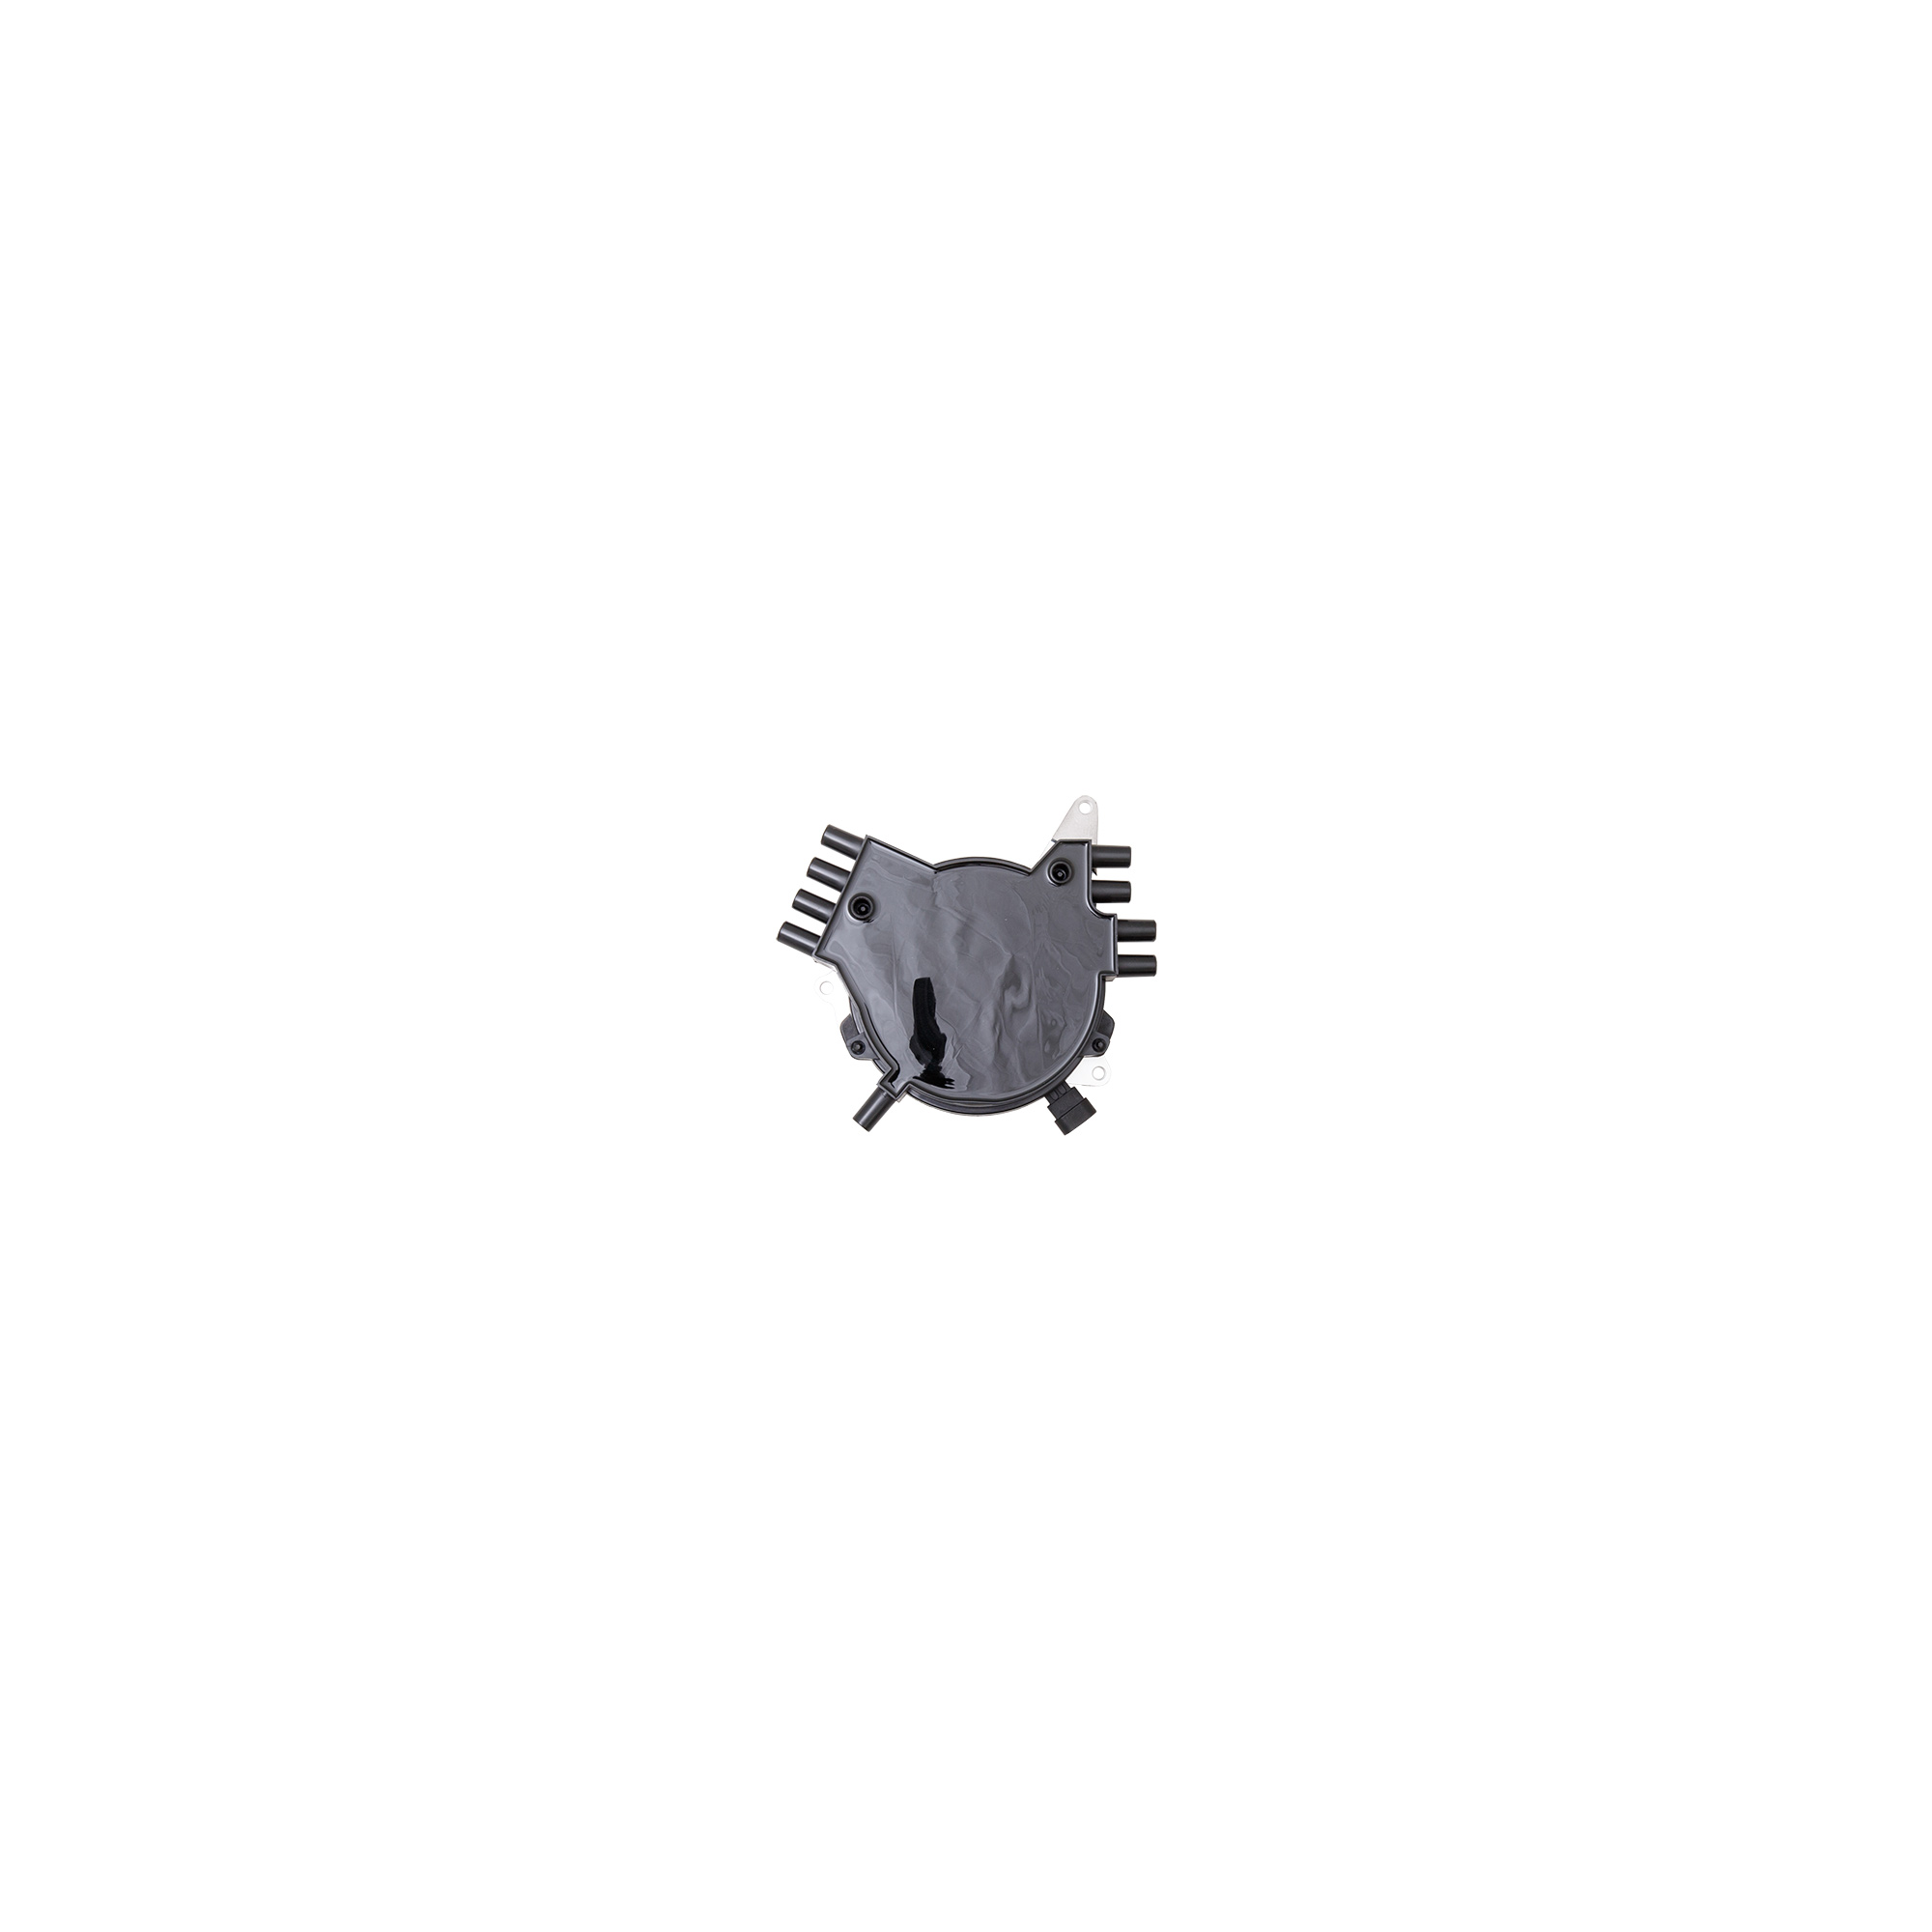 Lt1 Gm Optispark Gear Drive: Optispark I 1992-1994 LT1 Distributor